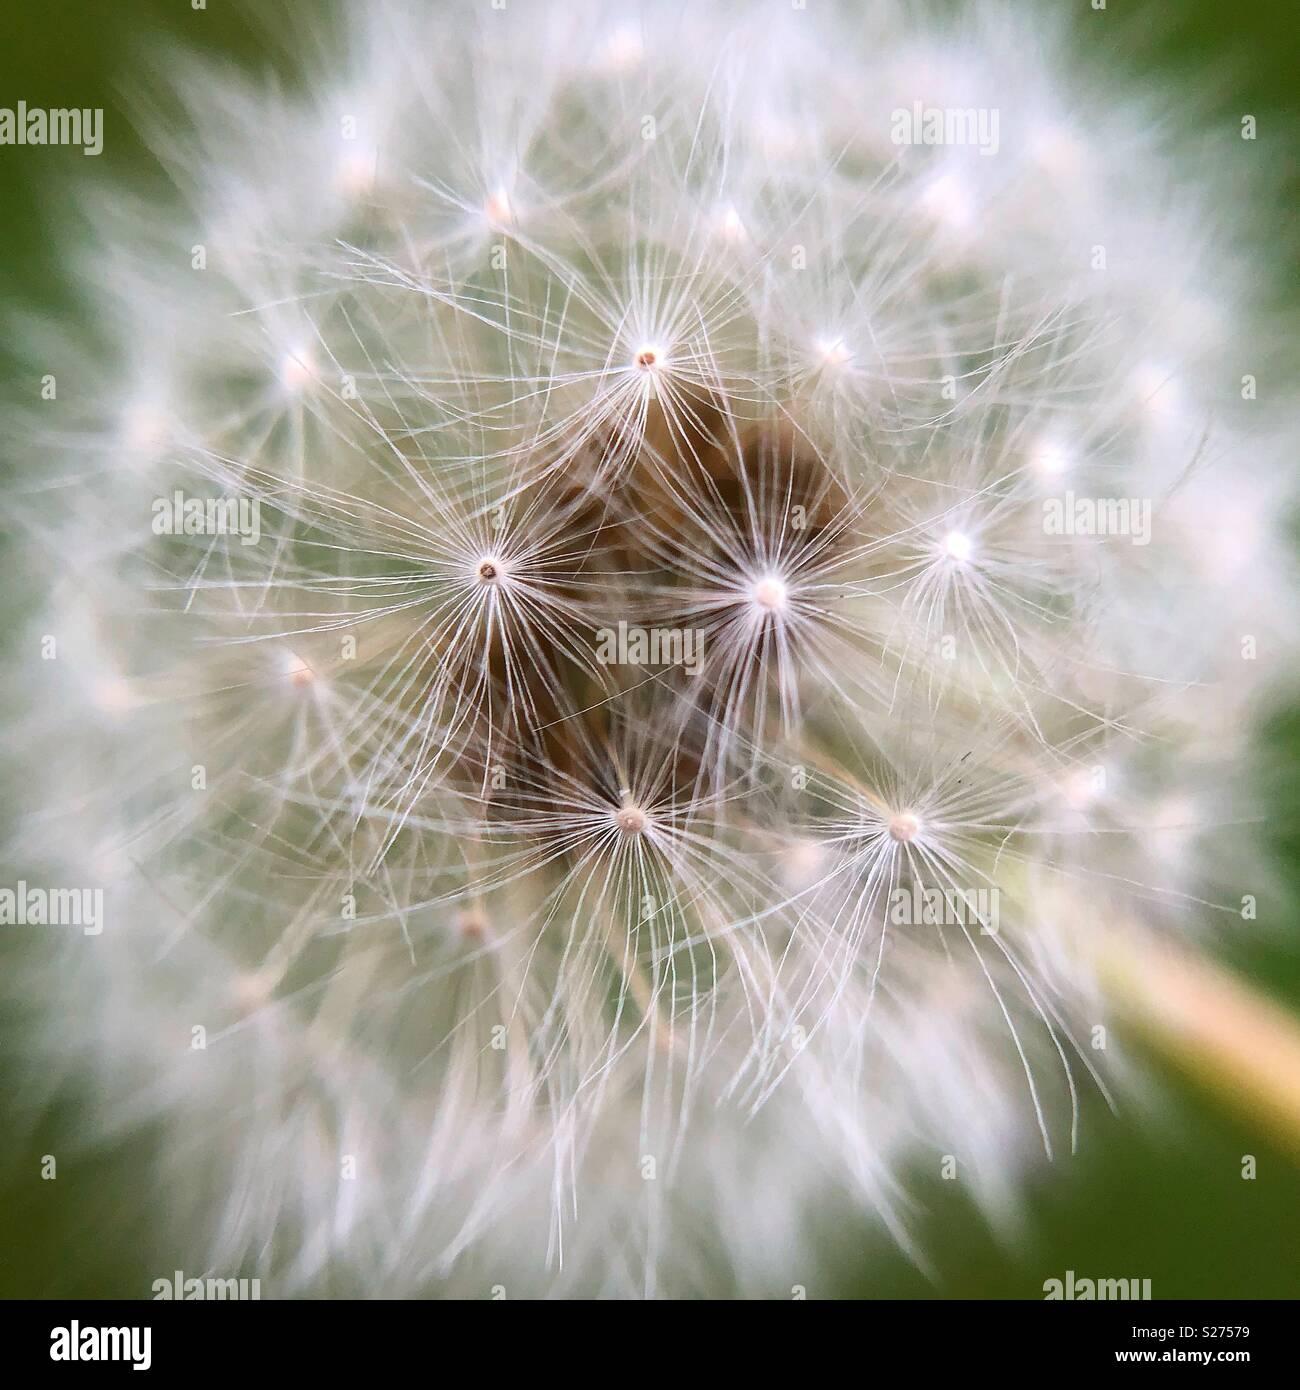 Dandelion fluff, Wayne County, Pennsylvania - Stock Image